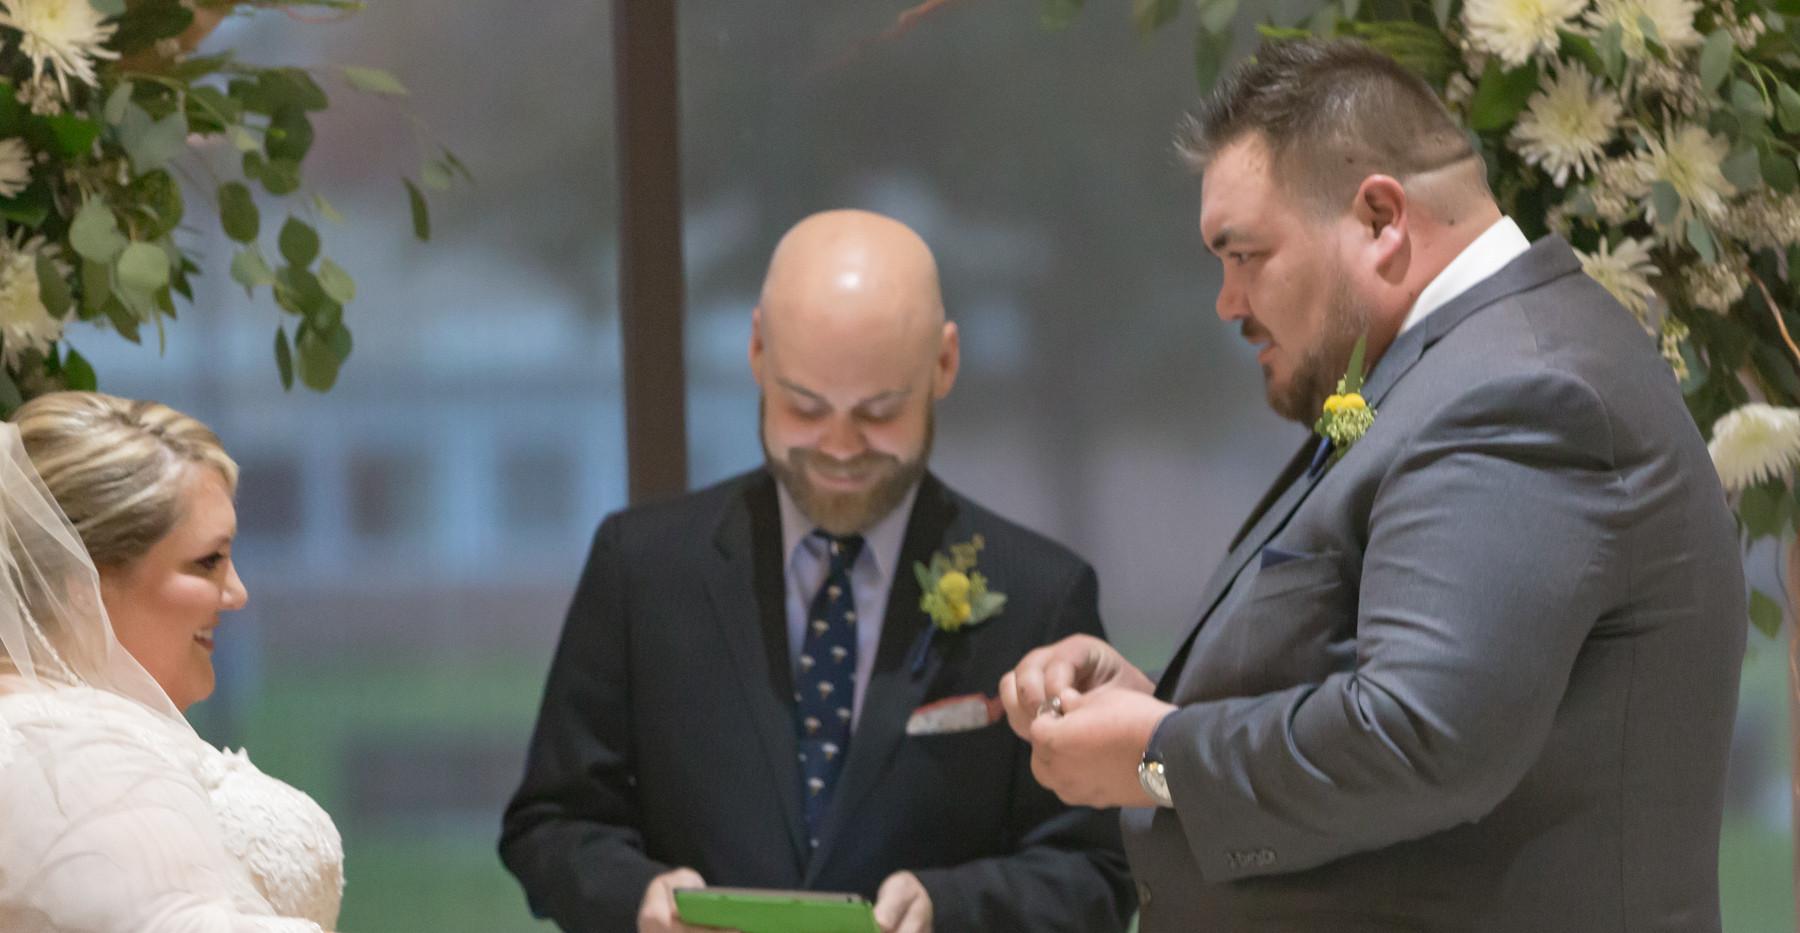 T+T Wedding - img_5498.jpg